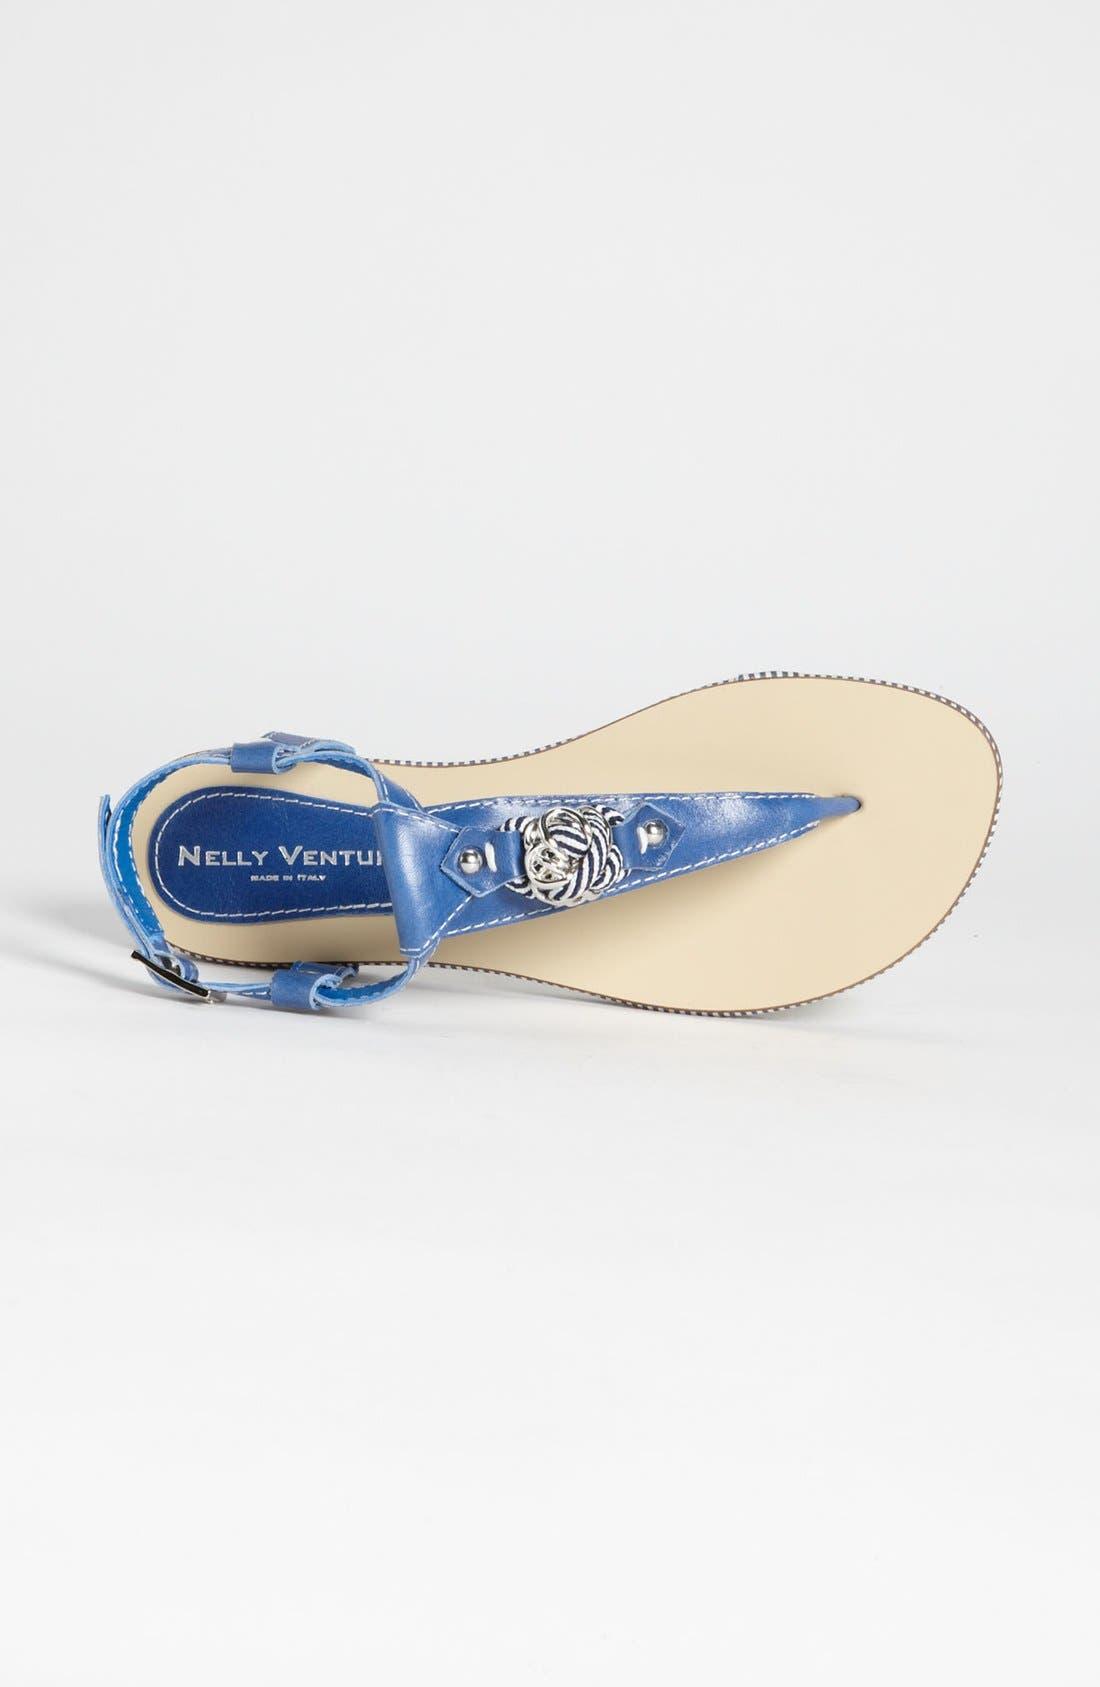 Alternate Image 3  - Nelly Venturi Thong Sandal